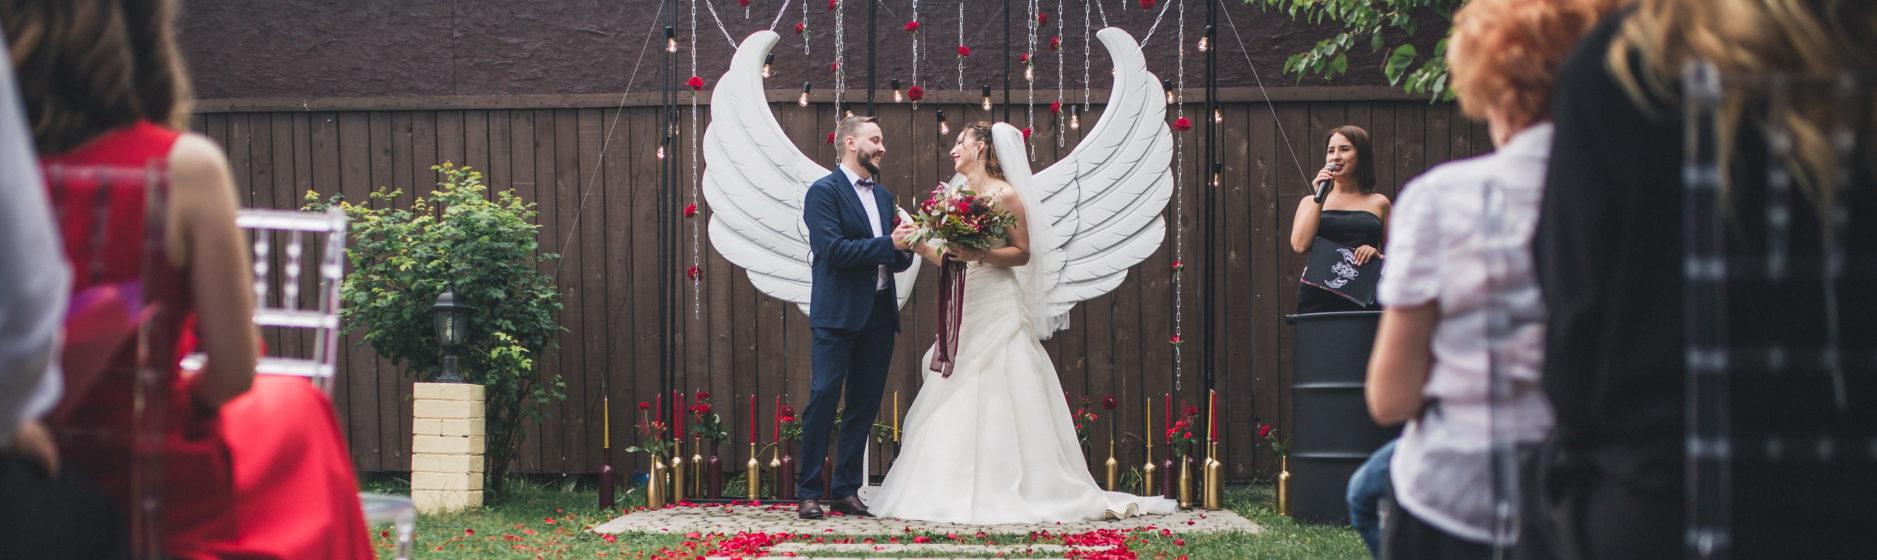 Rock-свадьба